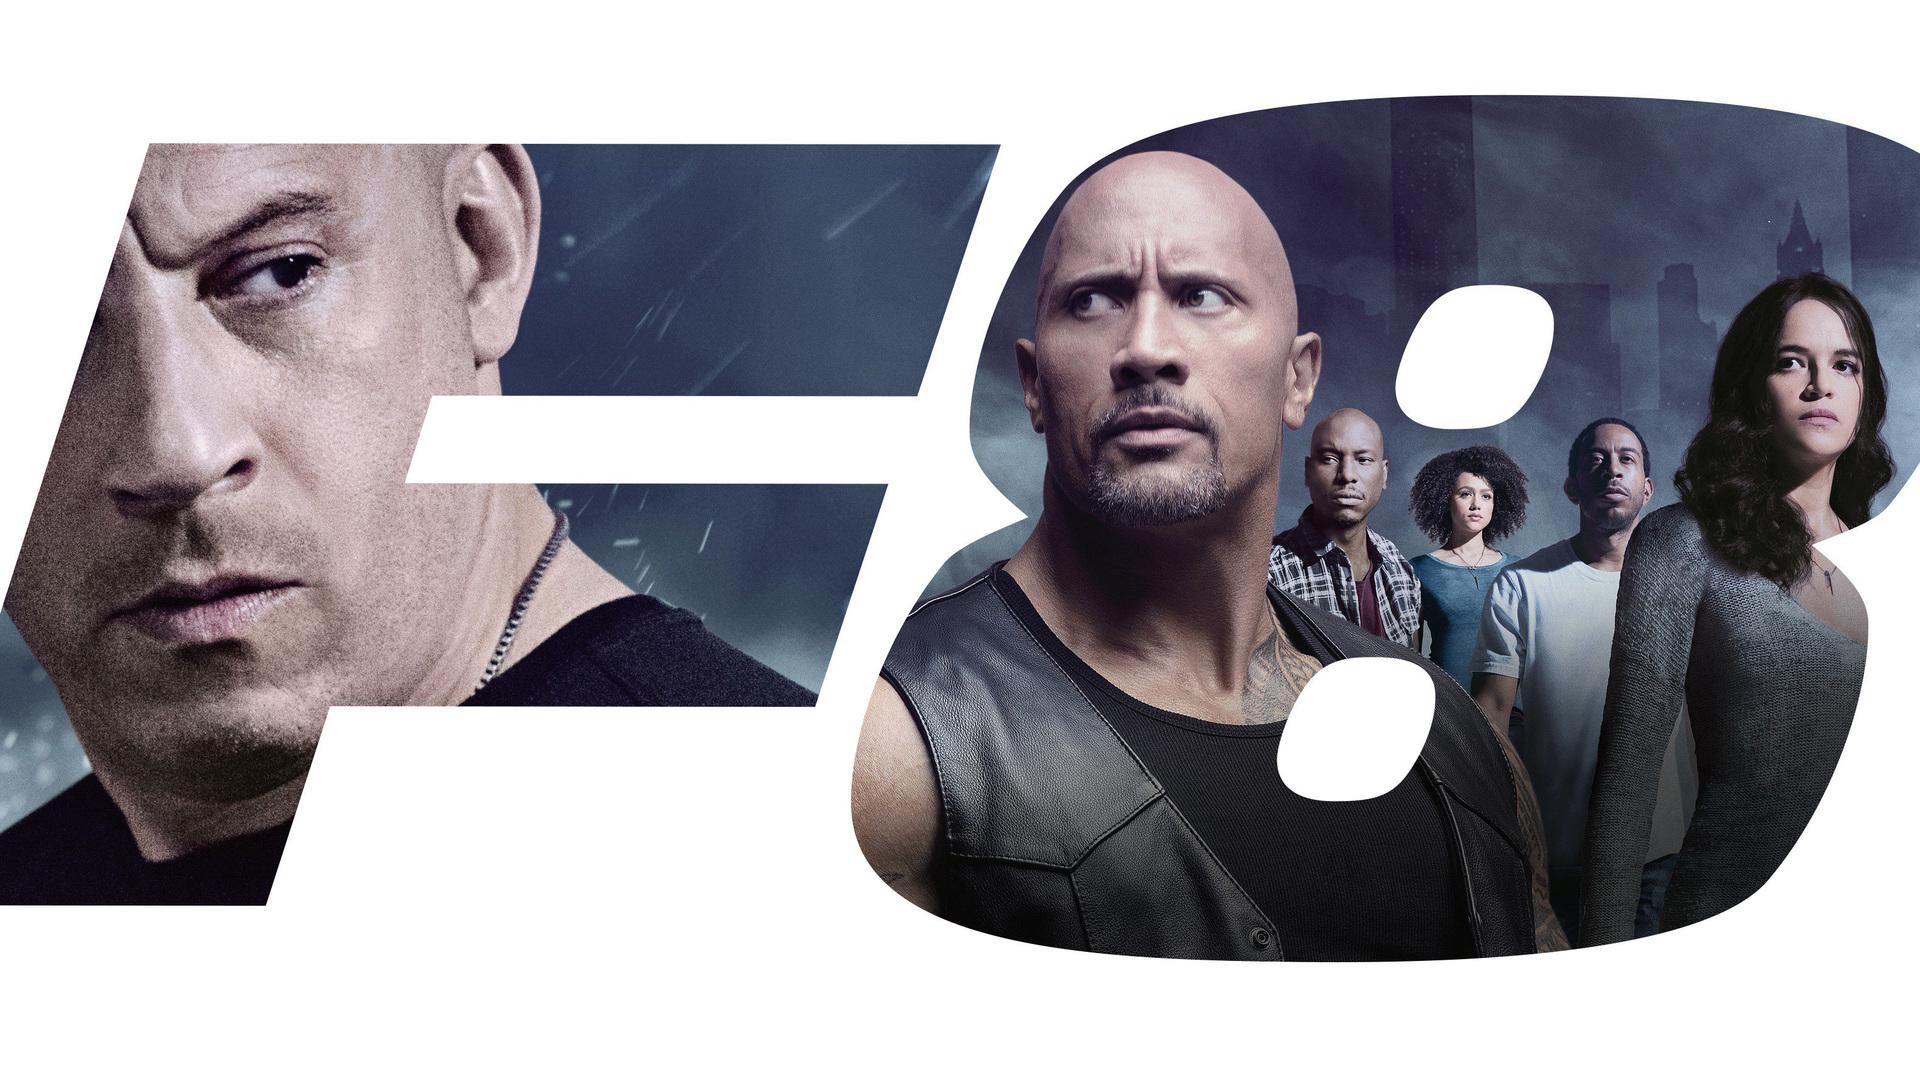 fast-8-the-fate-of-the-furious-qhd.jpg